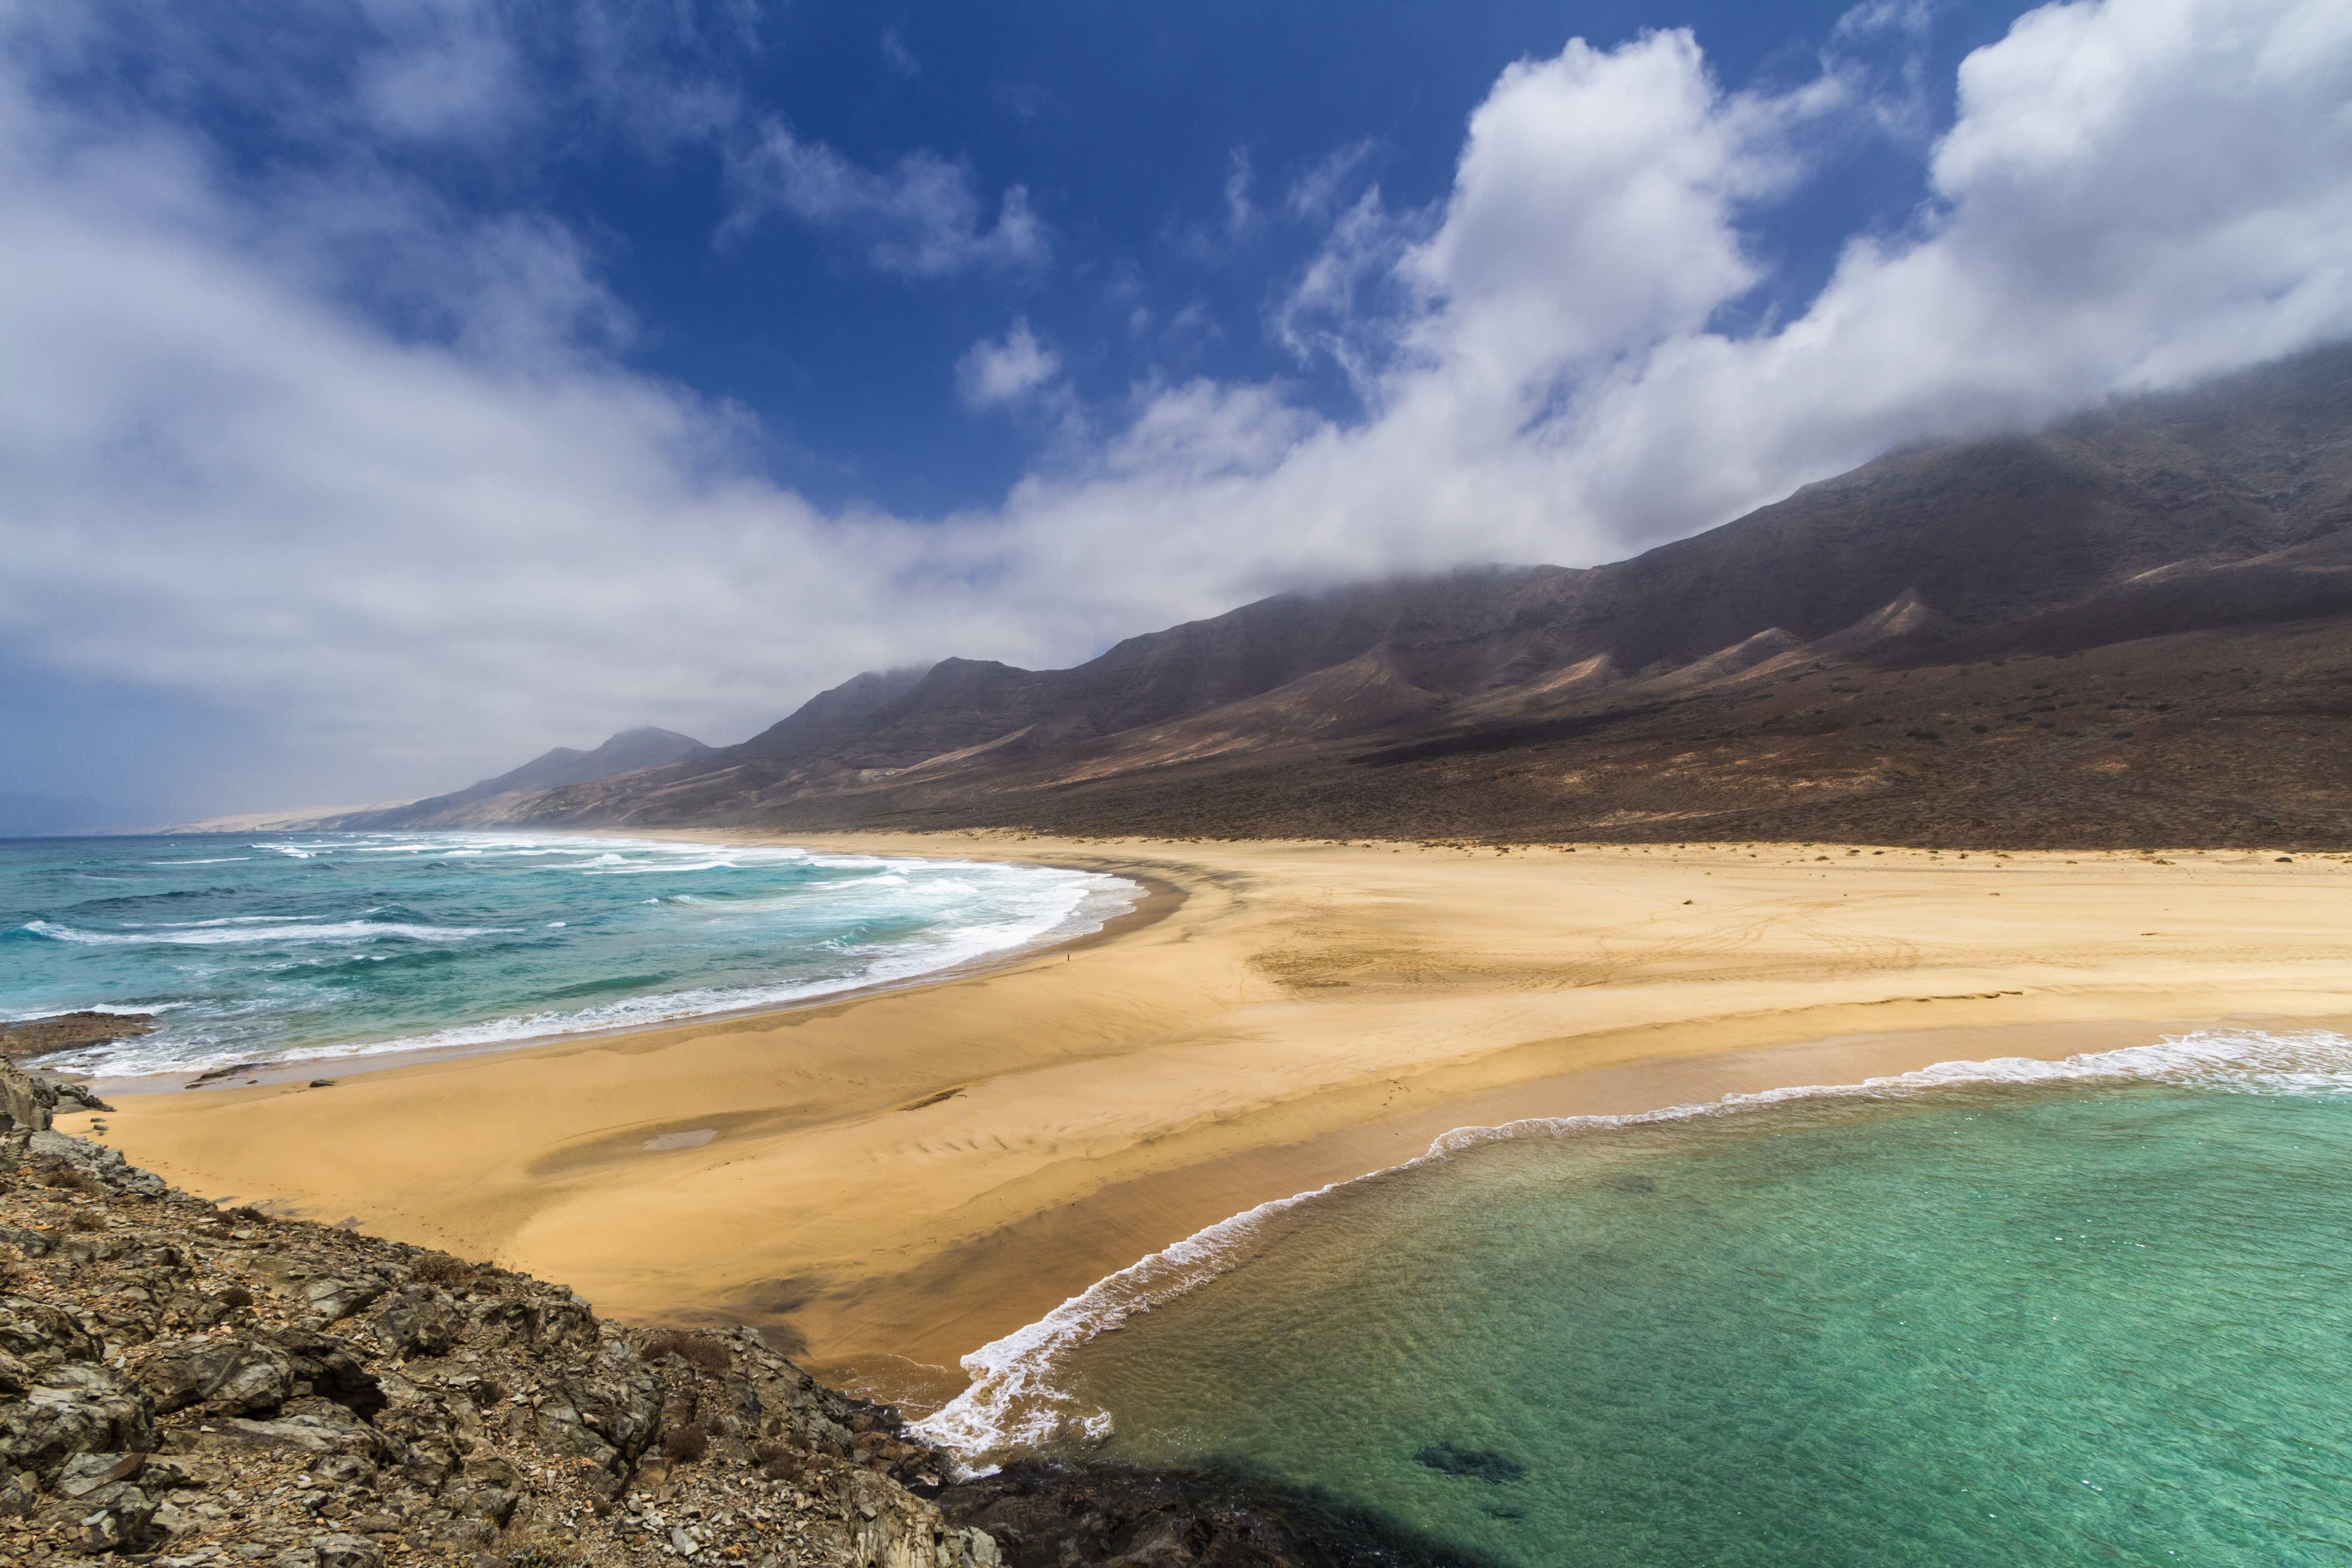 Turismo Islas Canarias - Fuerteventura